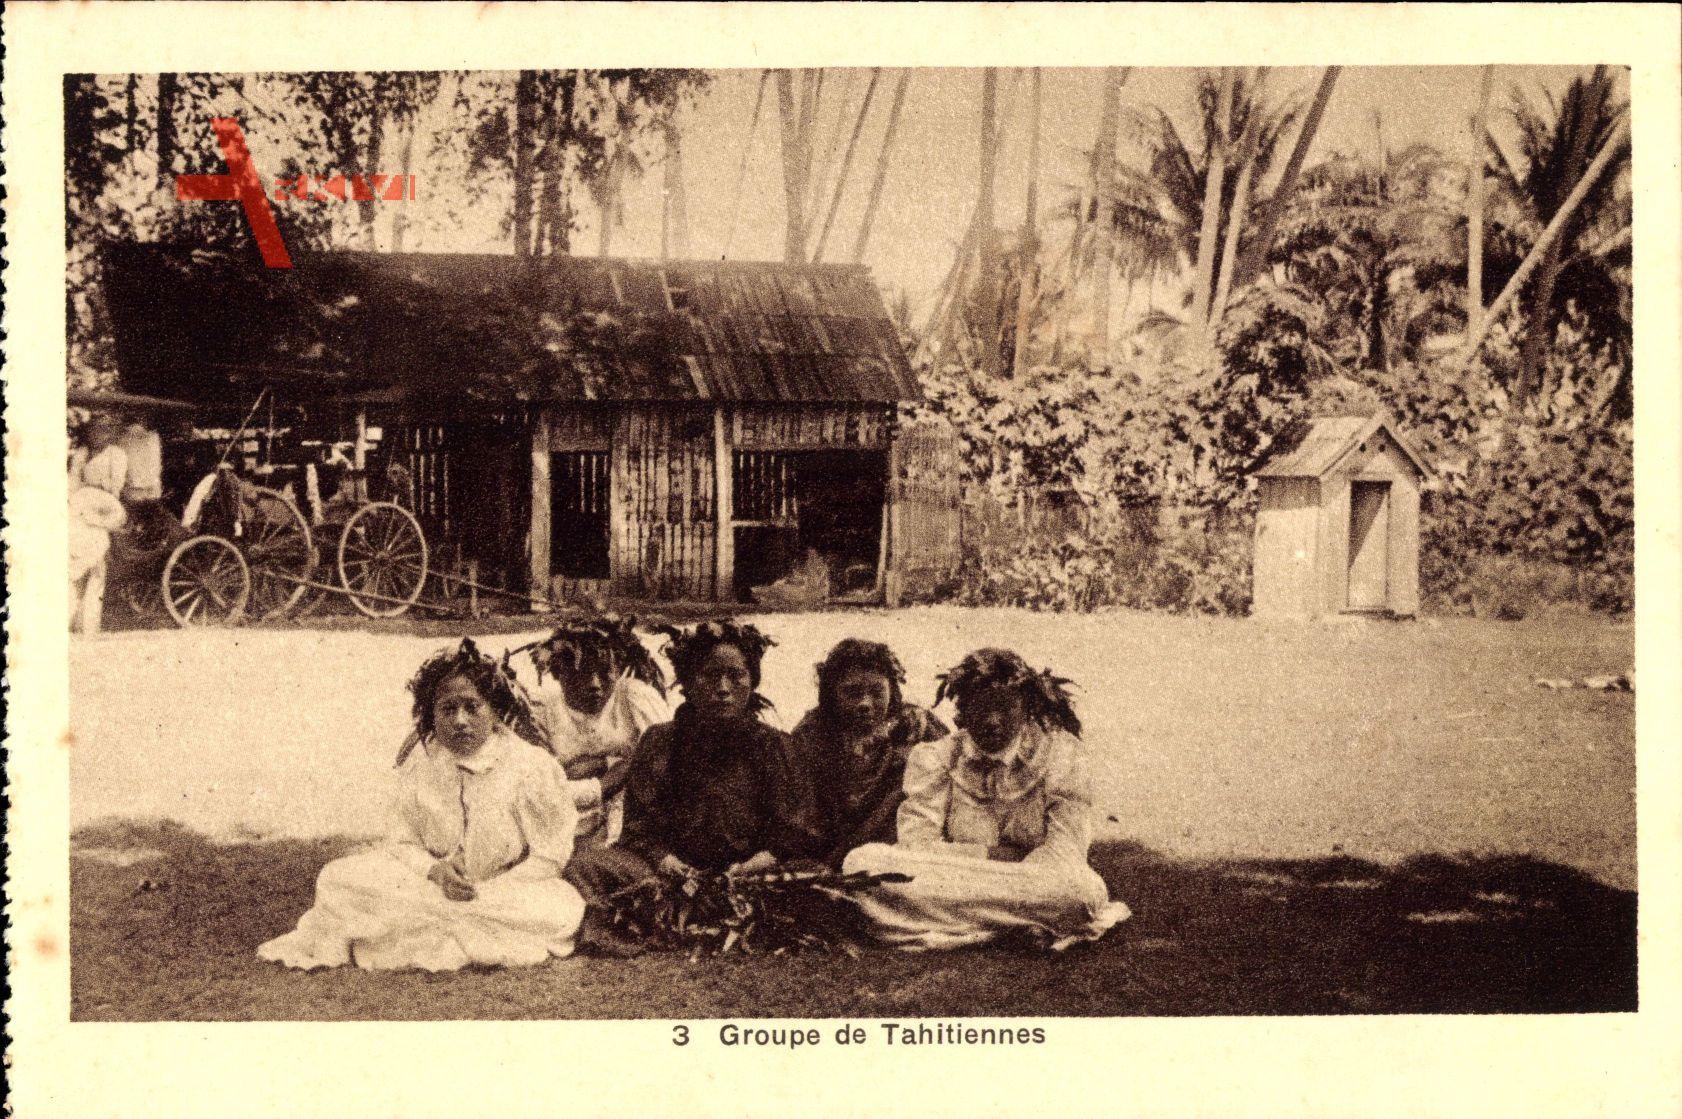 Groupe de Tahitiennes, Polynesien, Kinder mit Blumenkränzen